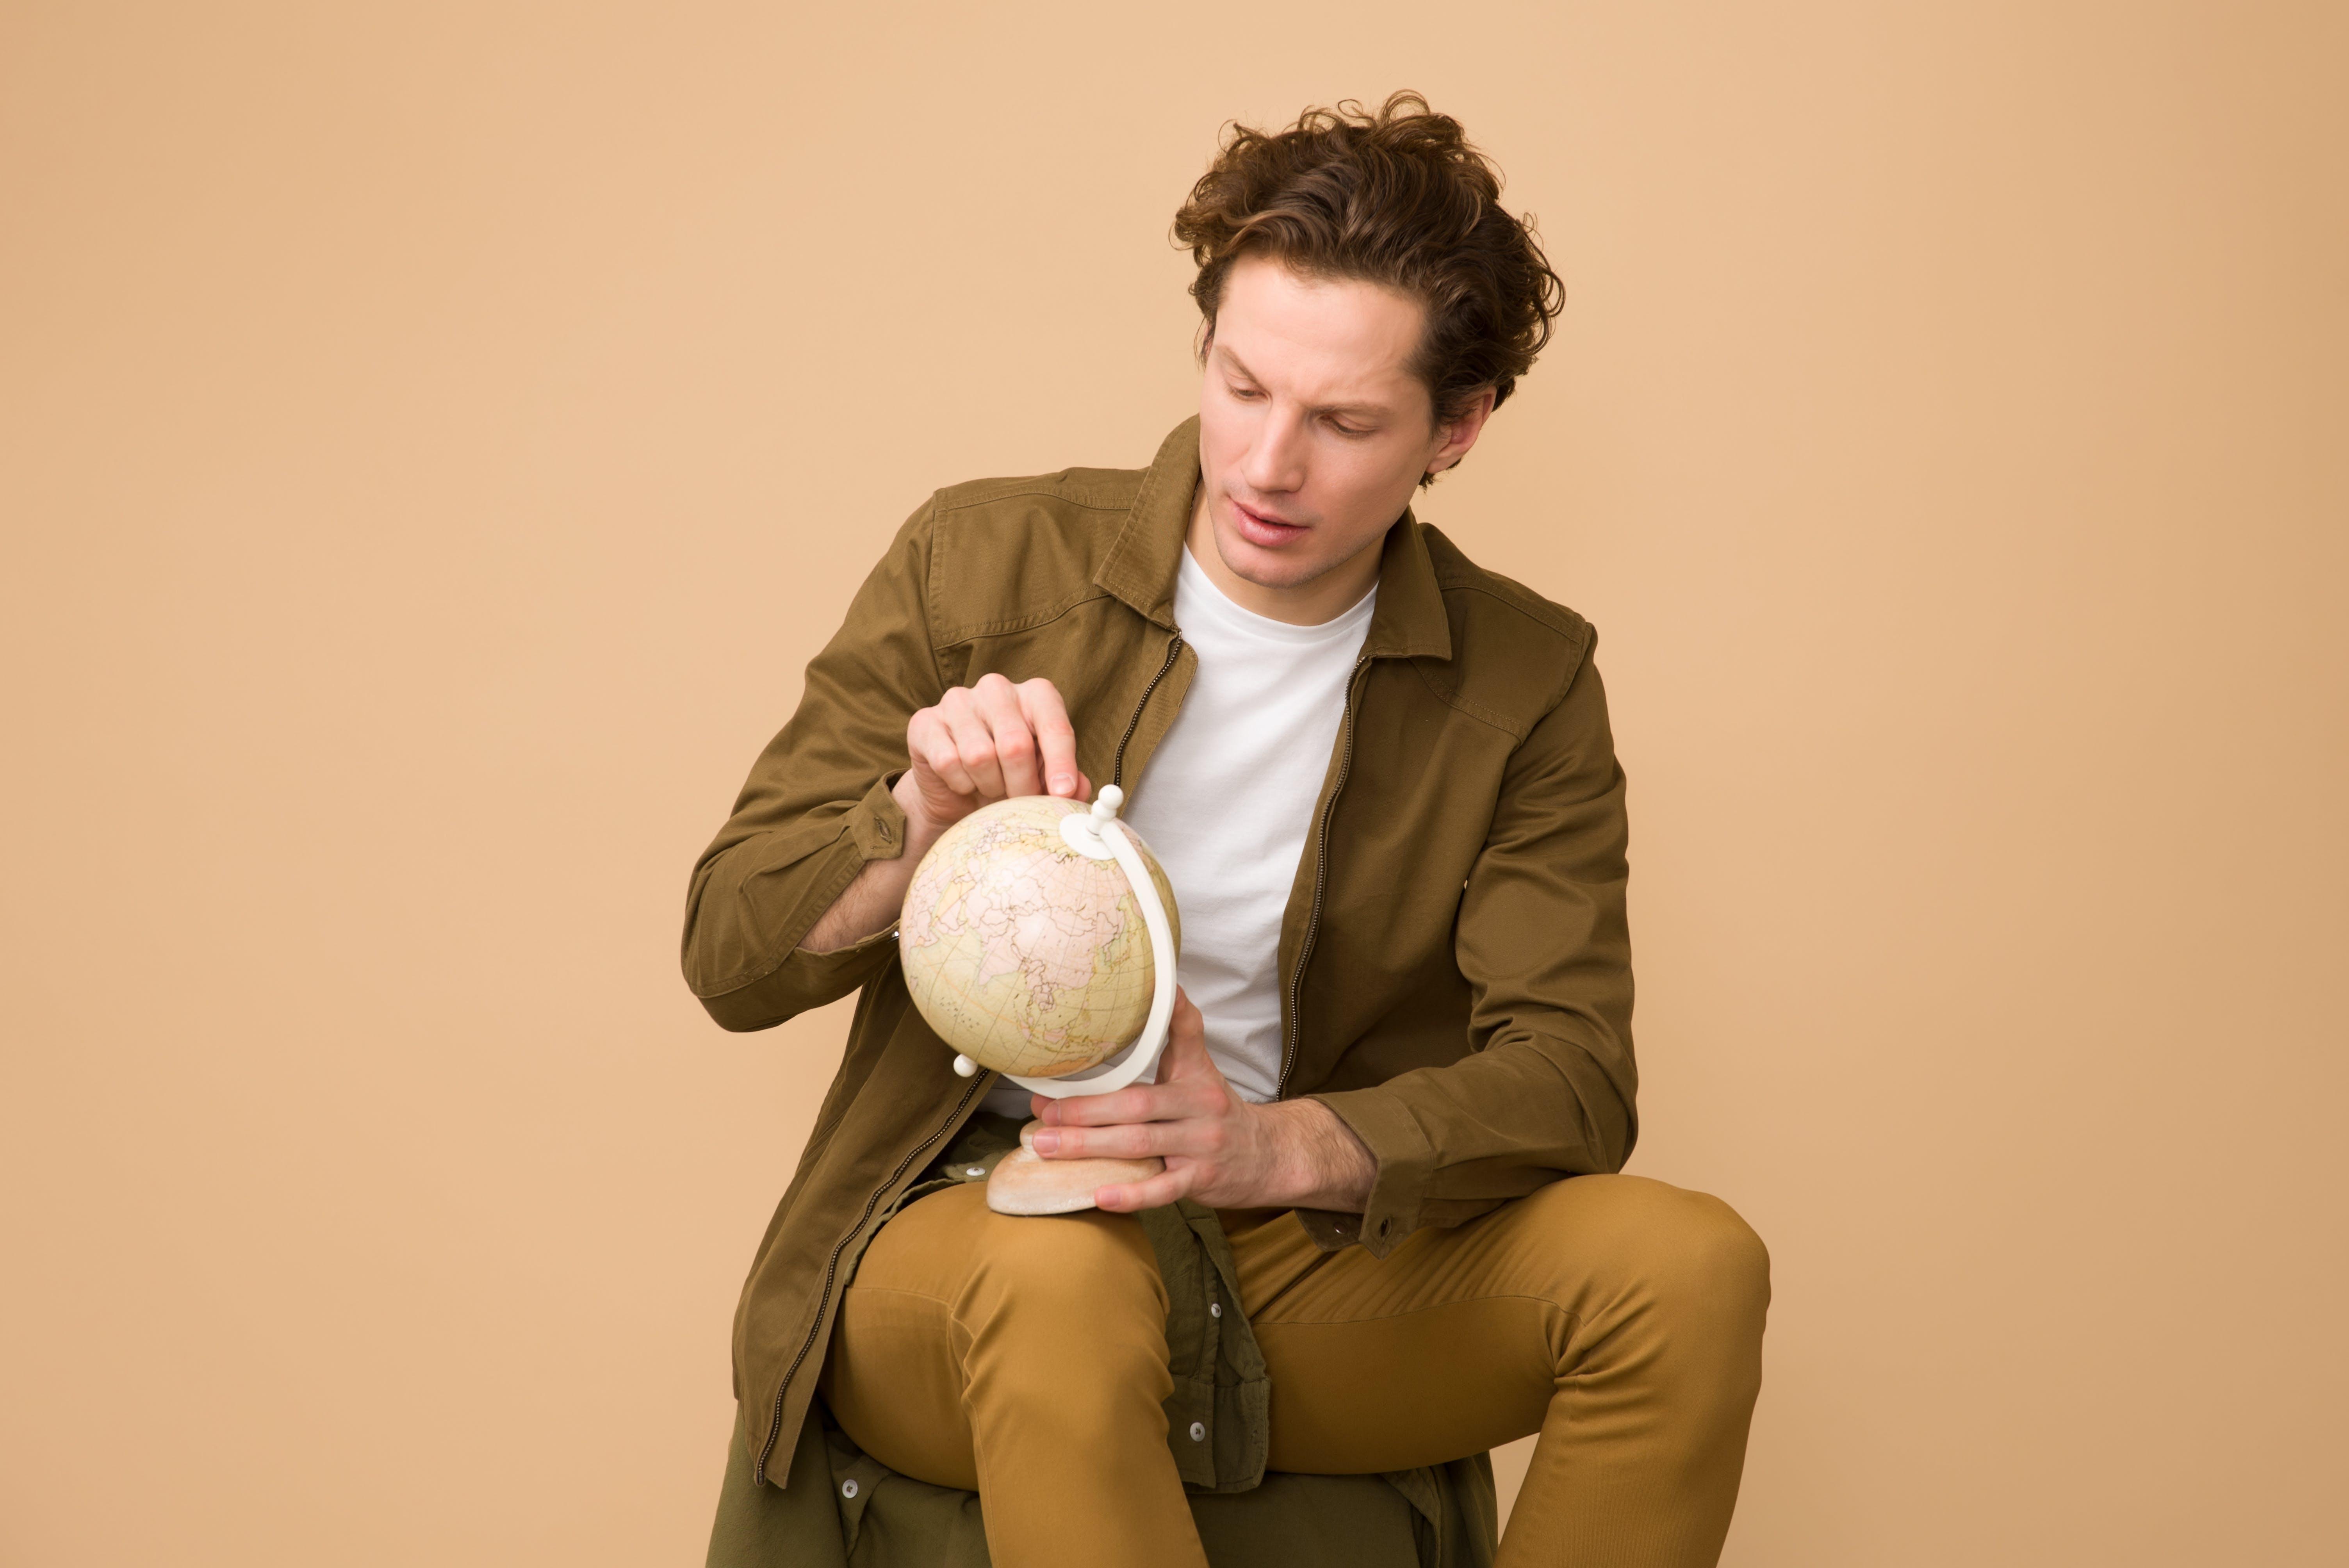 Man Sitting Holding White Desk Globe